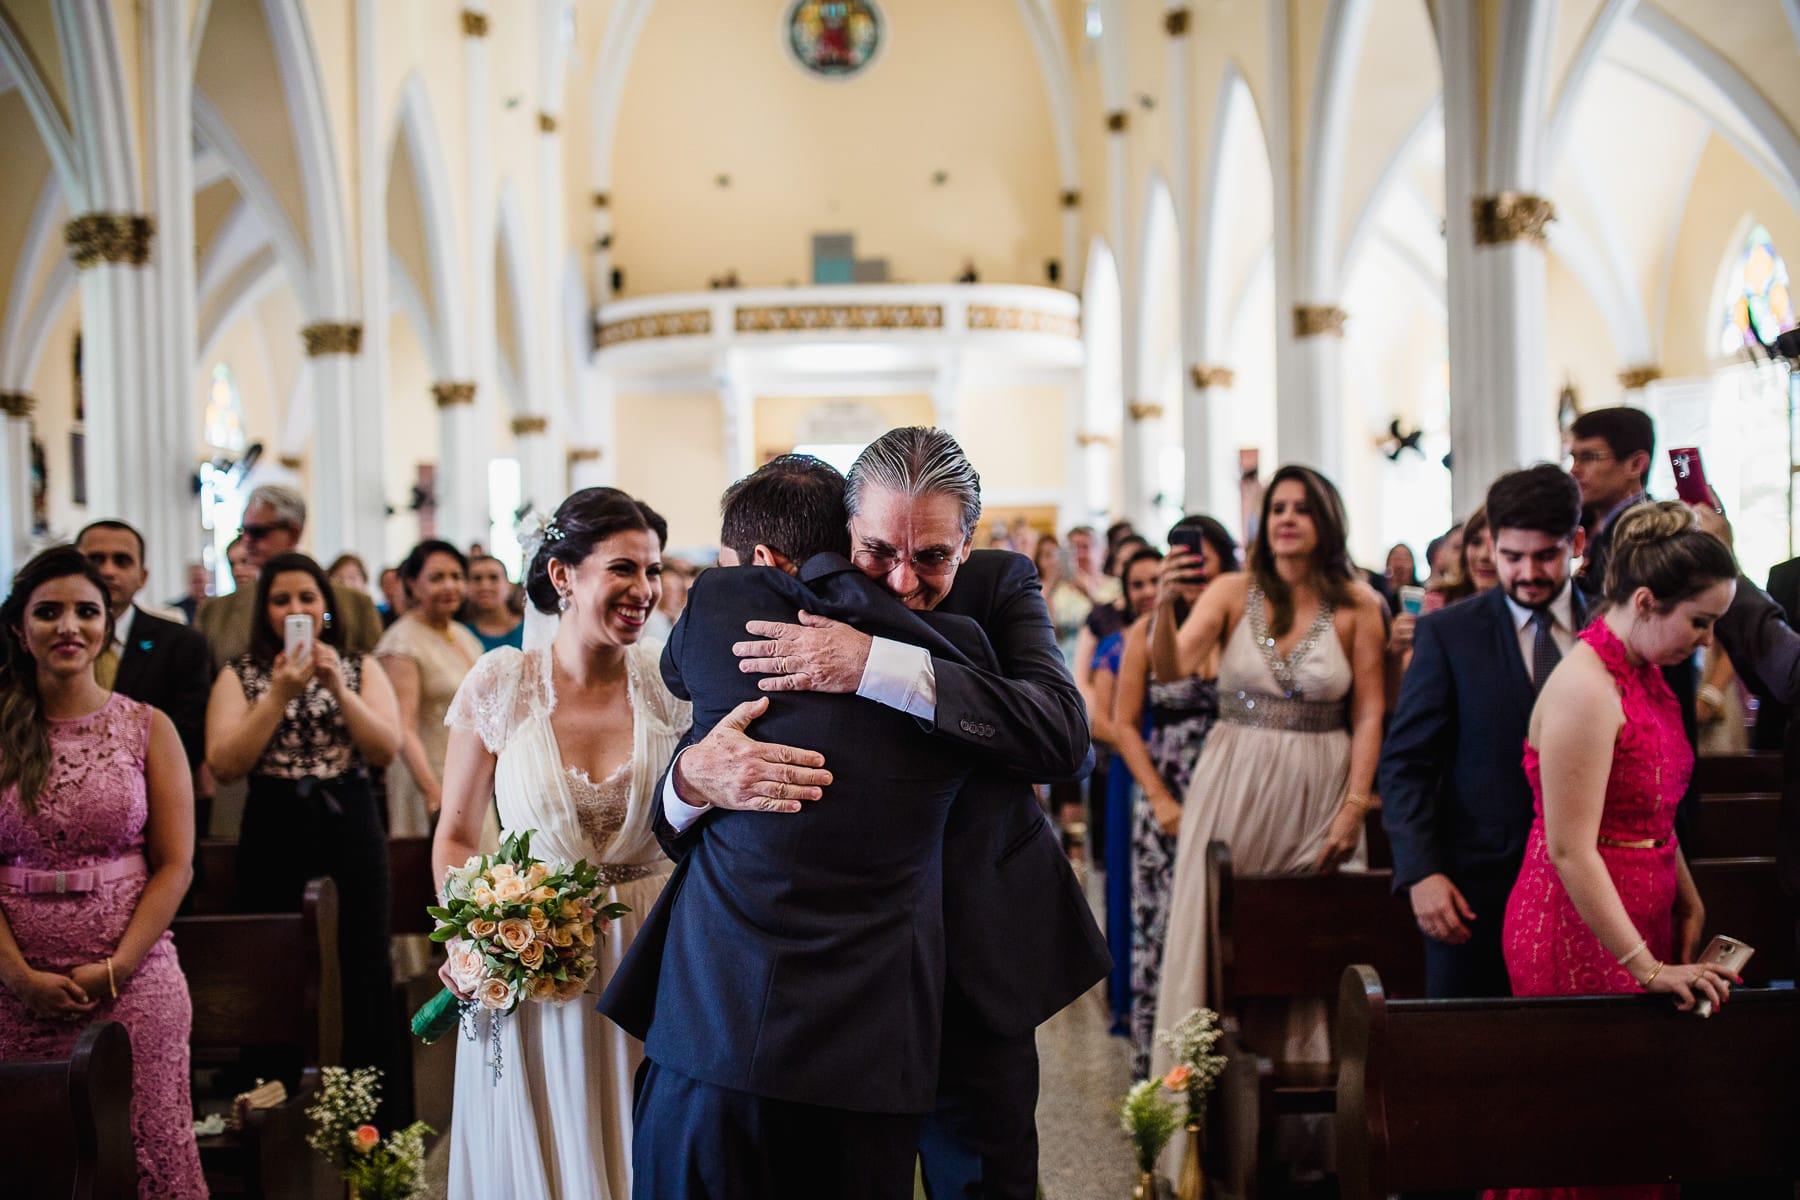 casamento-igreja-do-cristo-rei-fortaleza-23